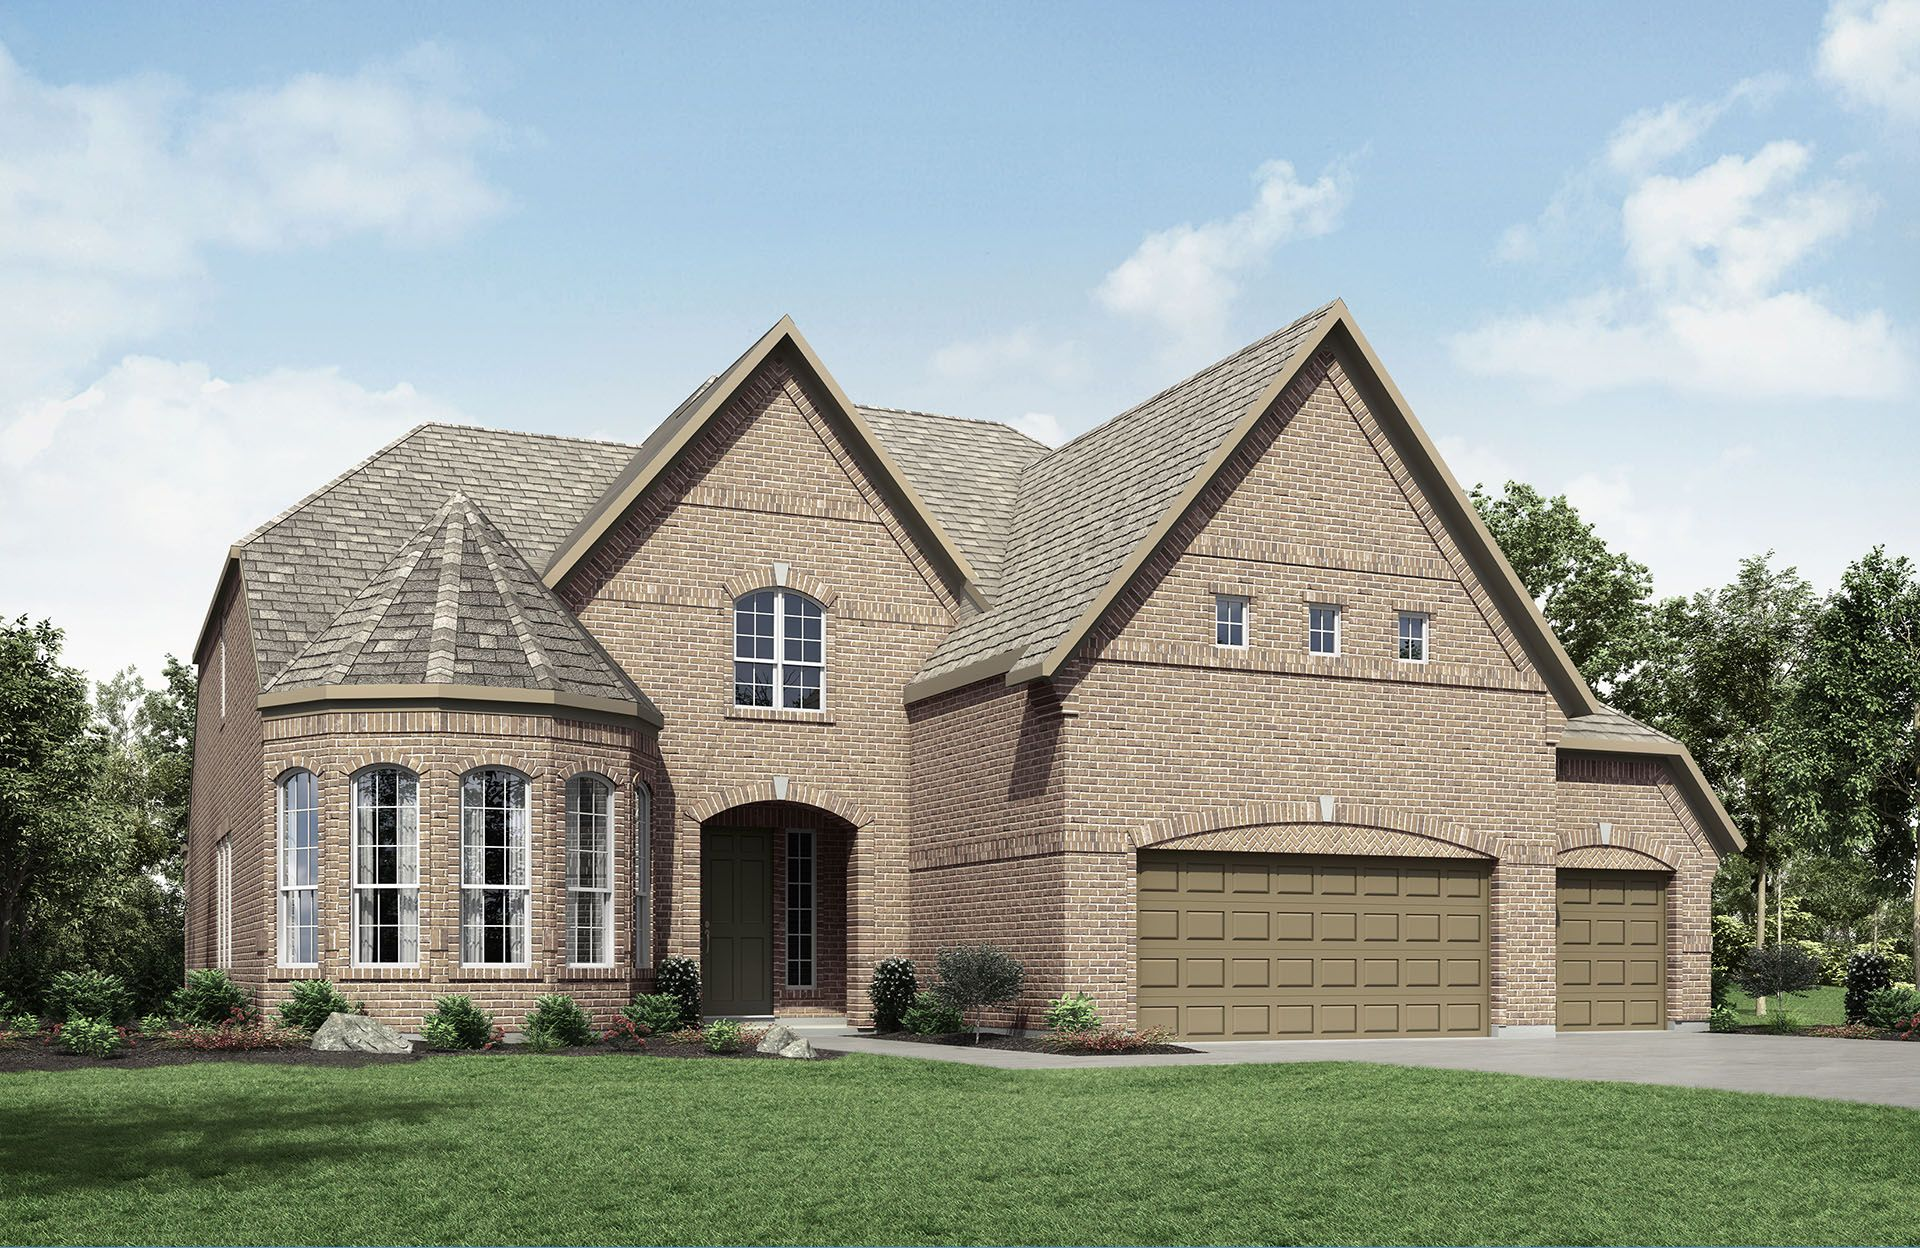 Single Family for Sale at Summer Lakes - Kenwood Ii 7427 Summer Night Lane Rosenberg, Texas 77469 United States